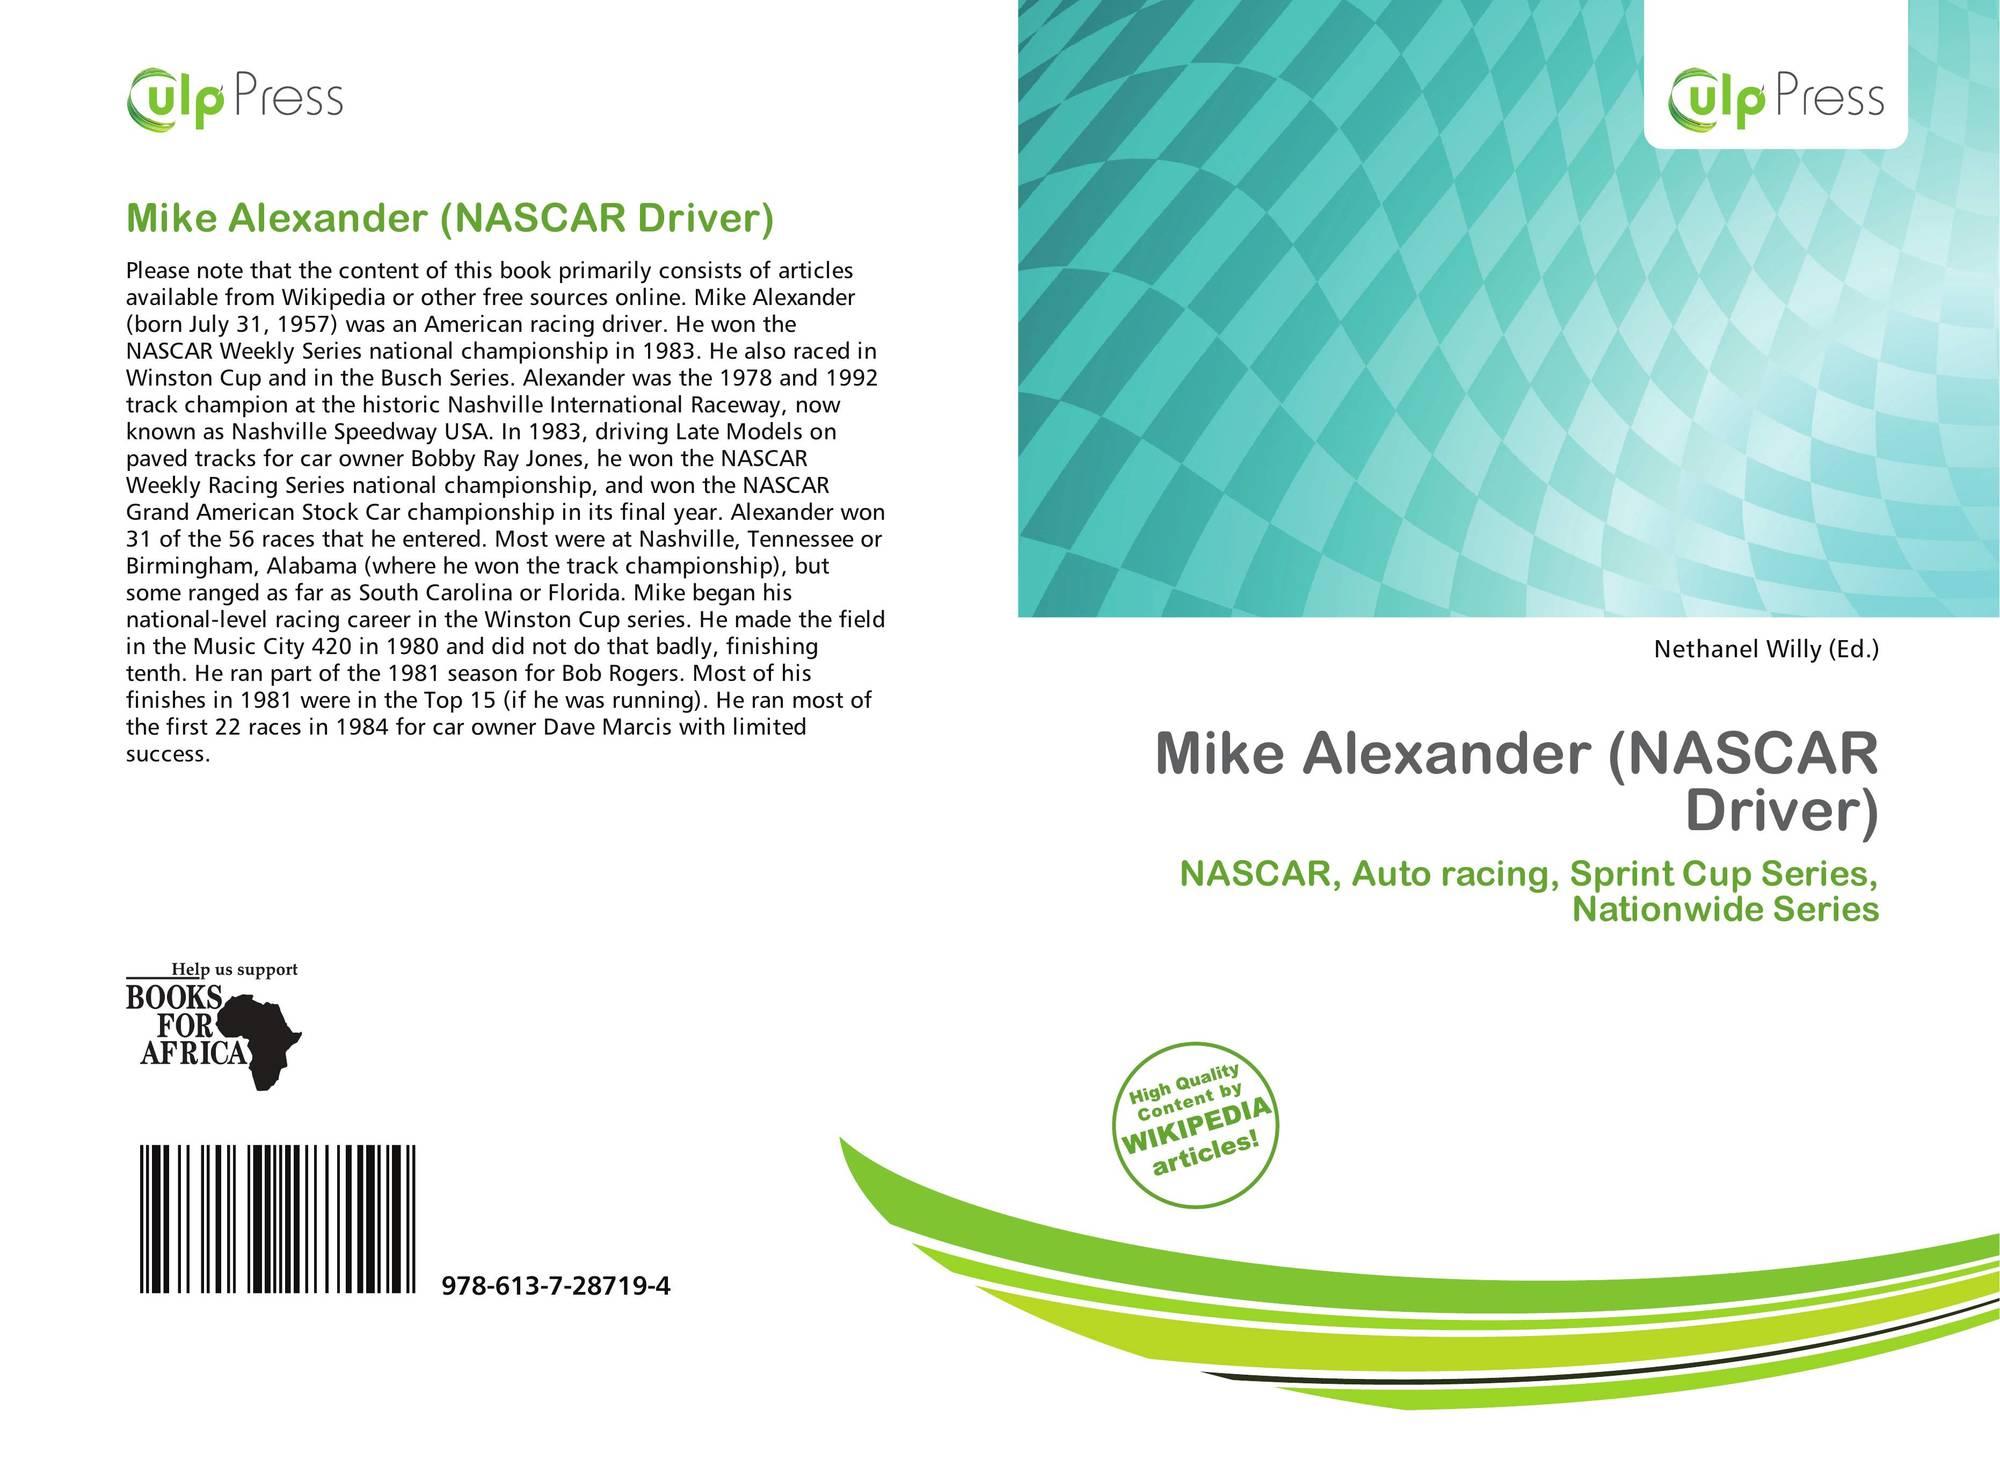 a career as a nascar driver essay